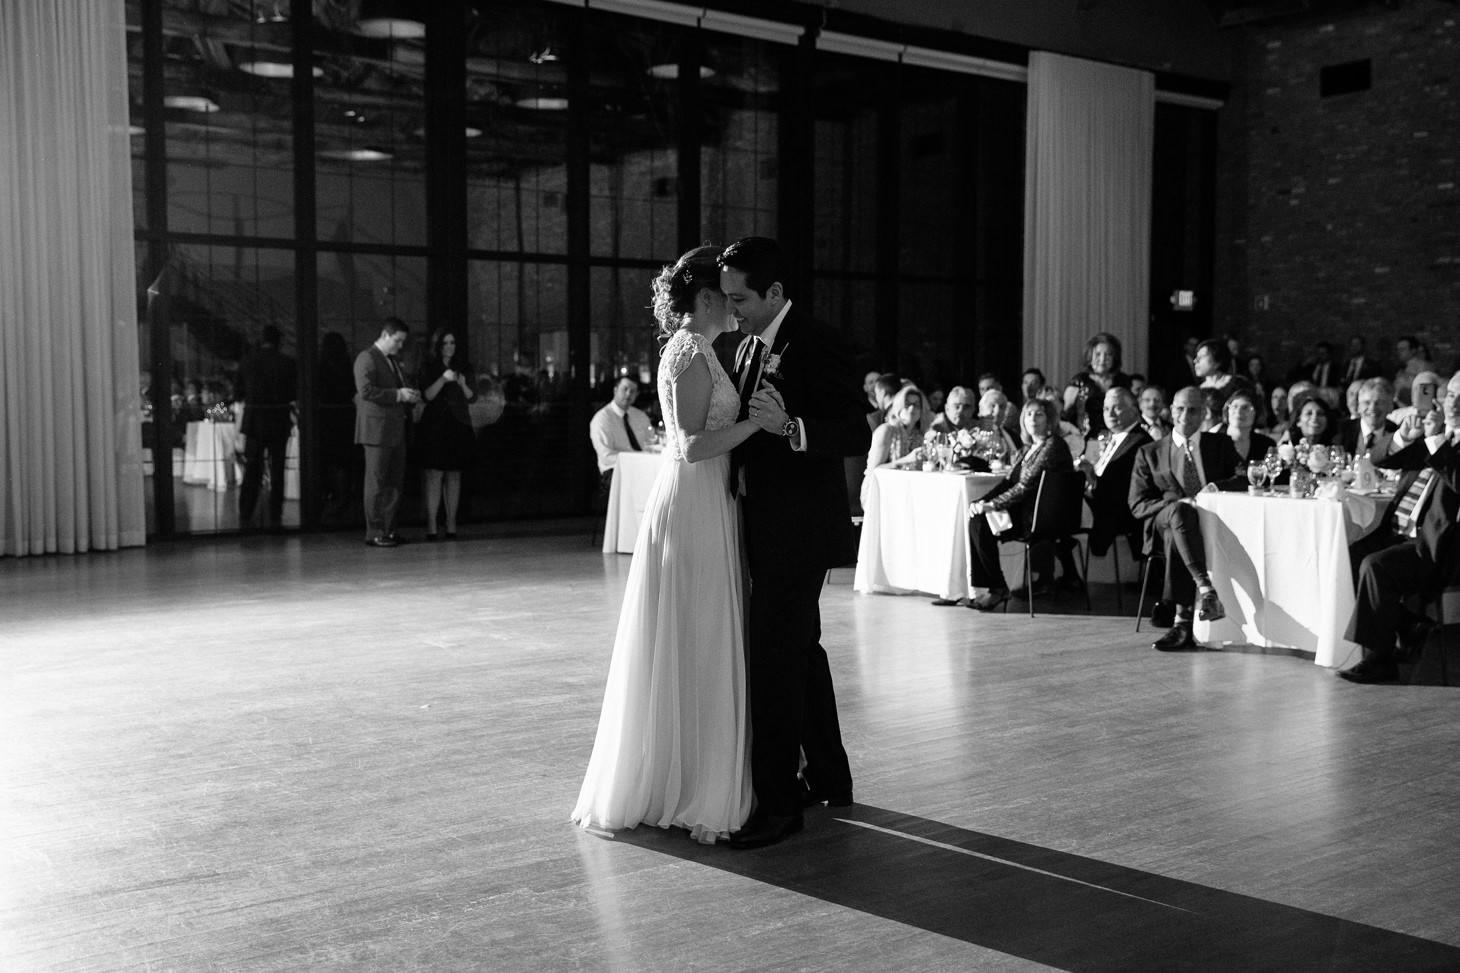 025-nyc-wedding-photographer-beacon-roundhouse-.jpg